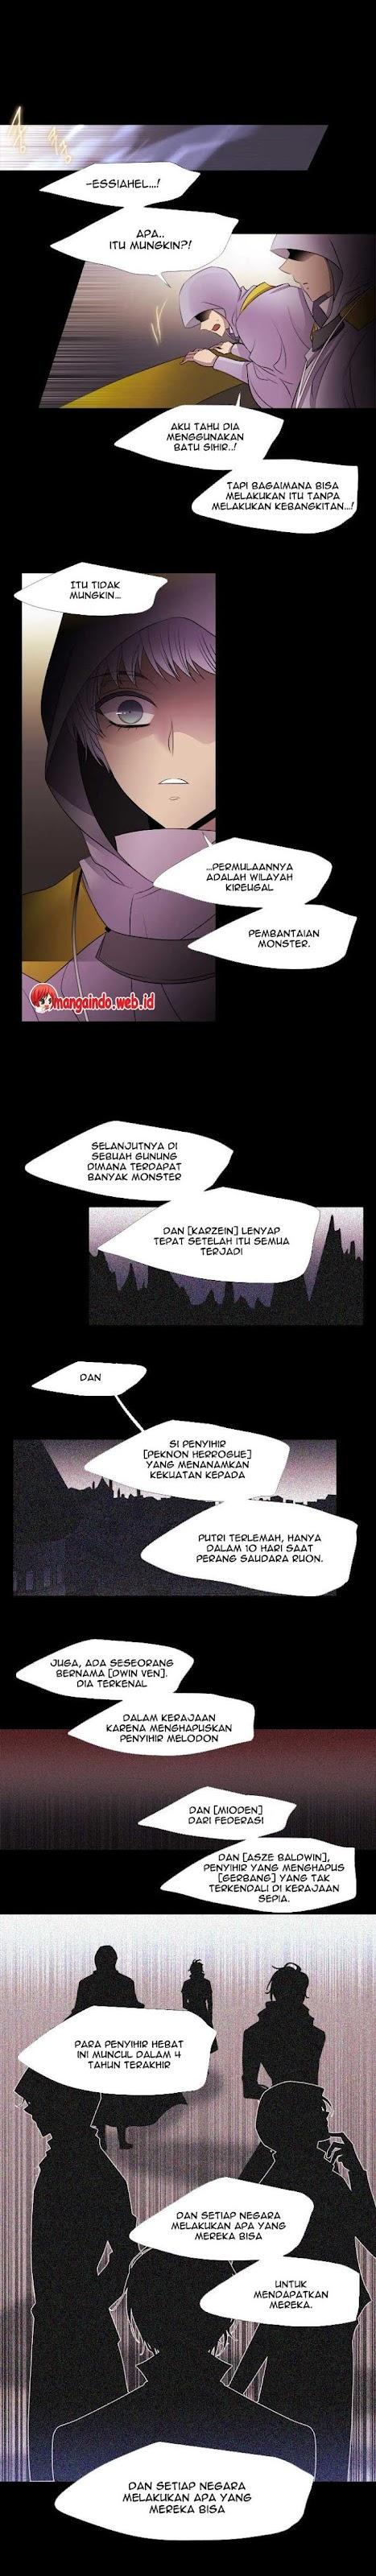 Komik black haze 213 - chapter 213 214 Indonesia black haze 213 - chapter 213 Terbaru 11|Baca Manga Komik Indonesia